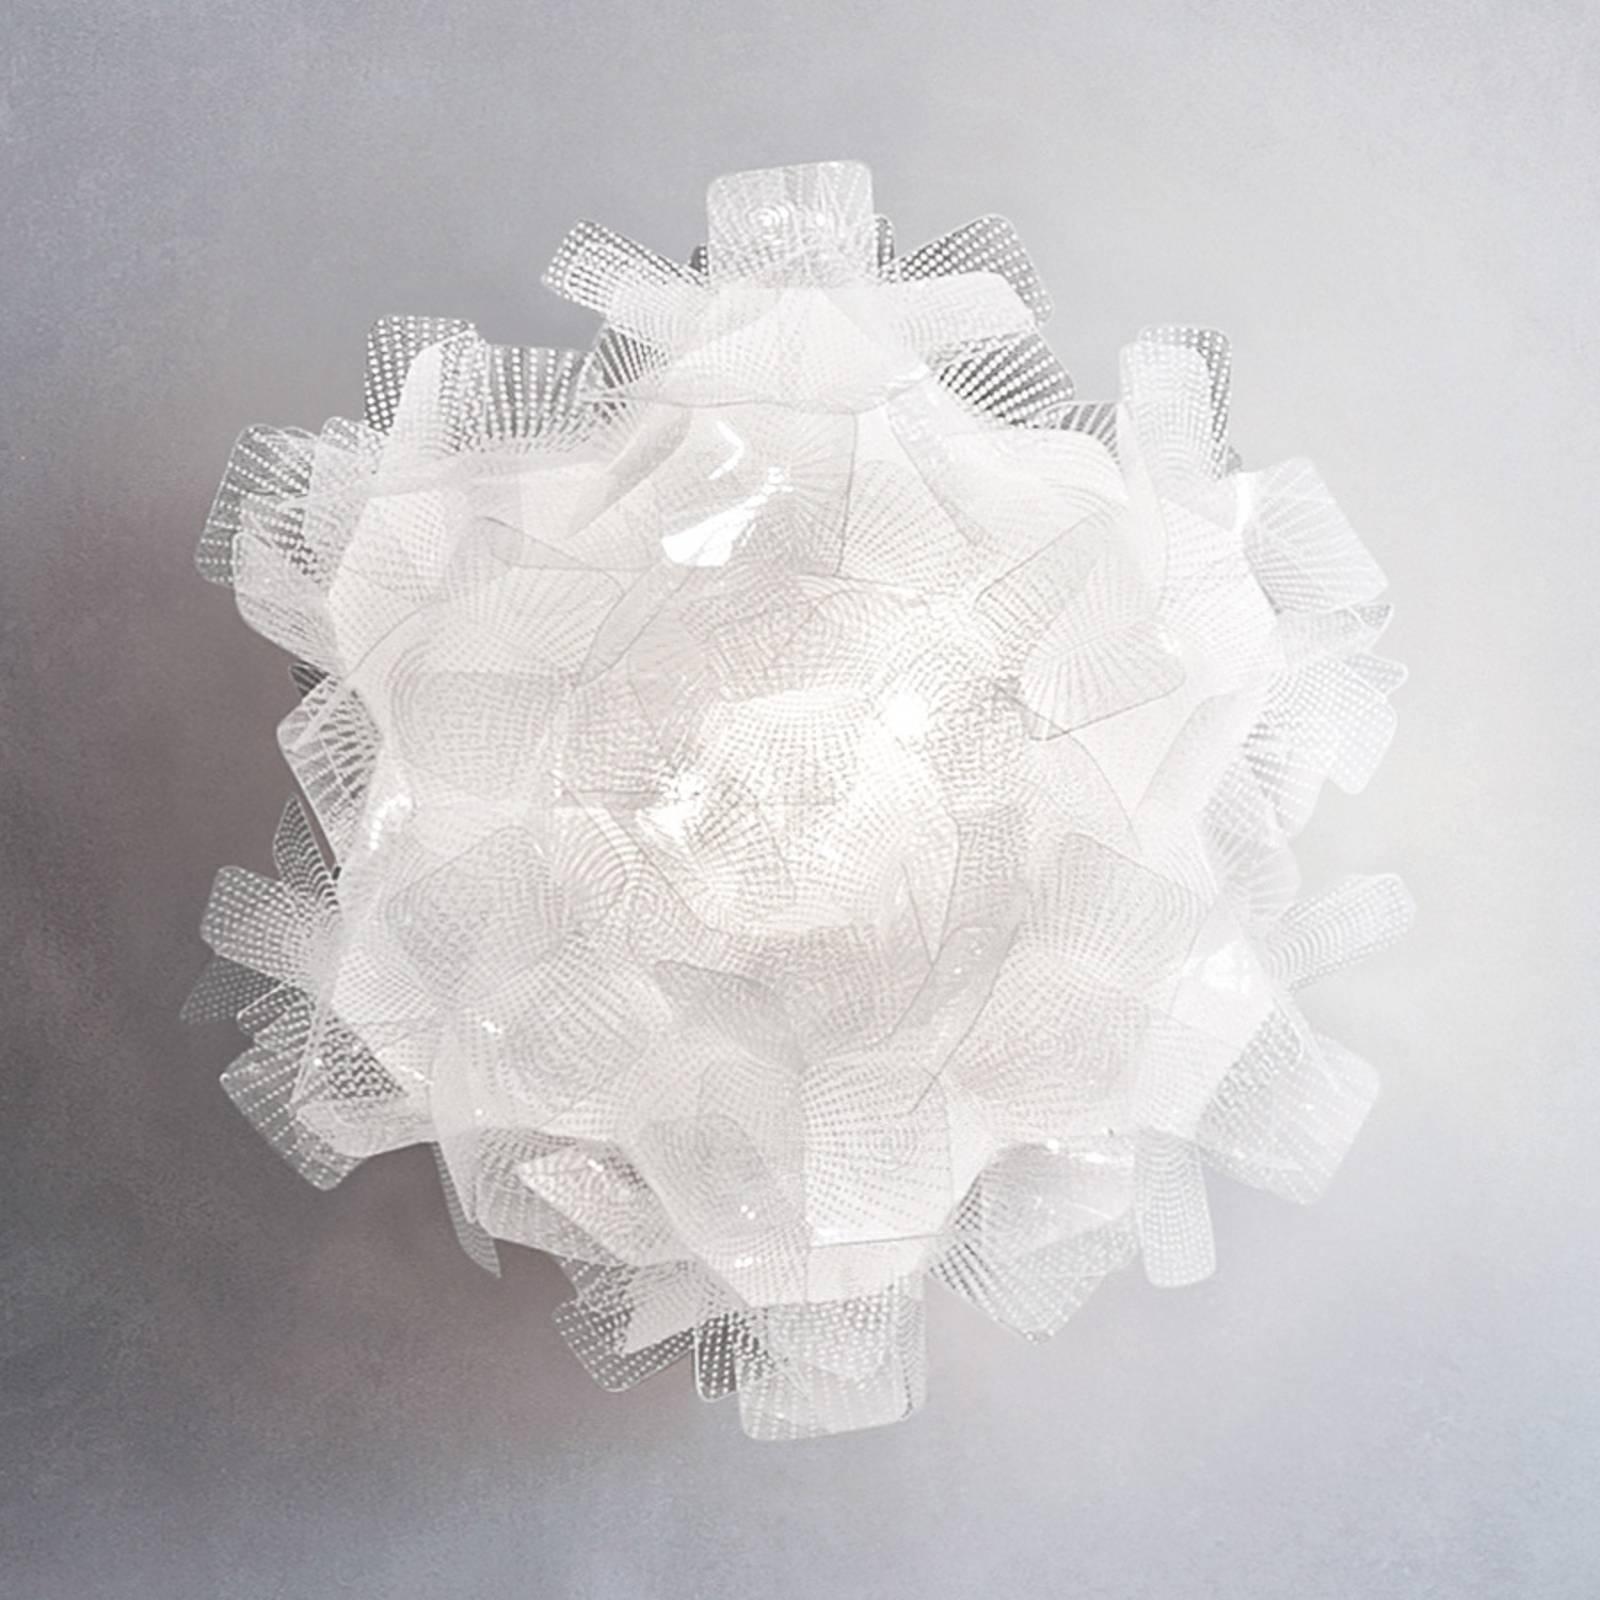 Slamp Clizia Pixel wandlamp Ø 32 cm